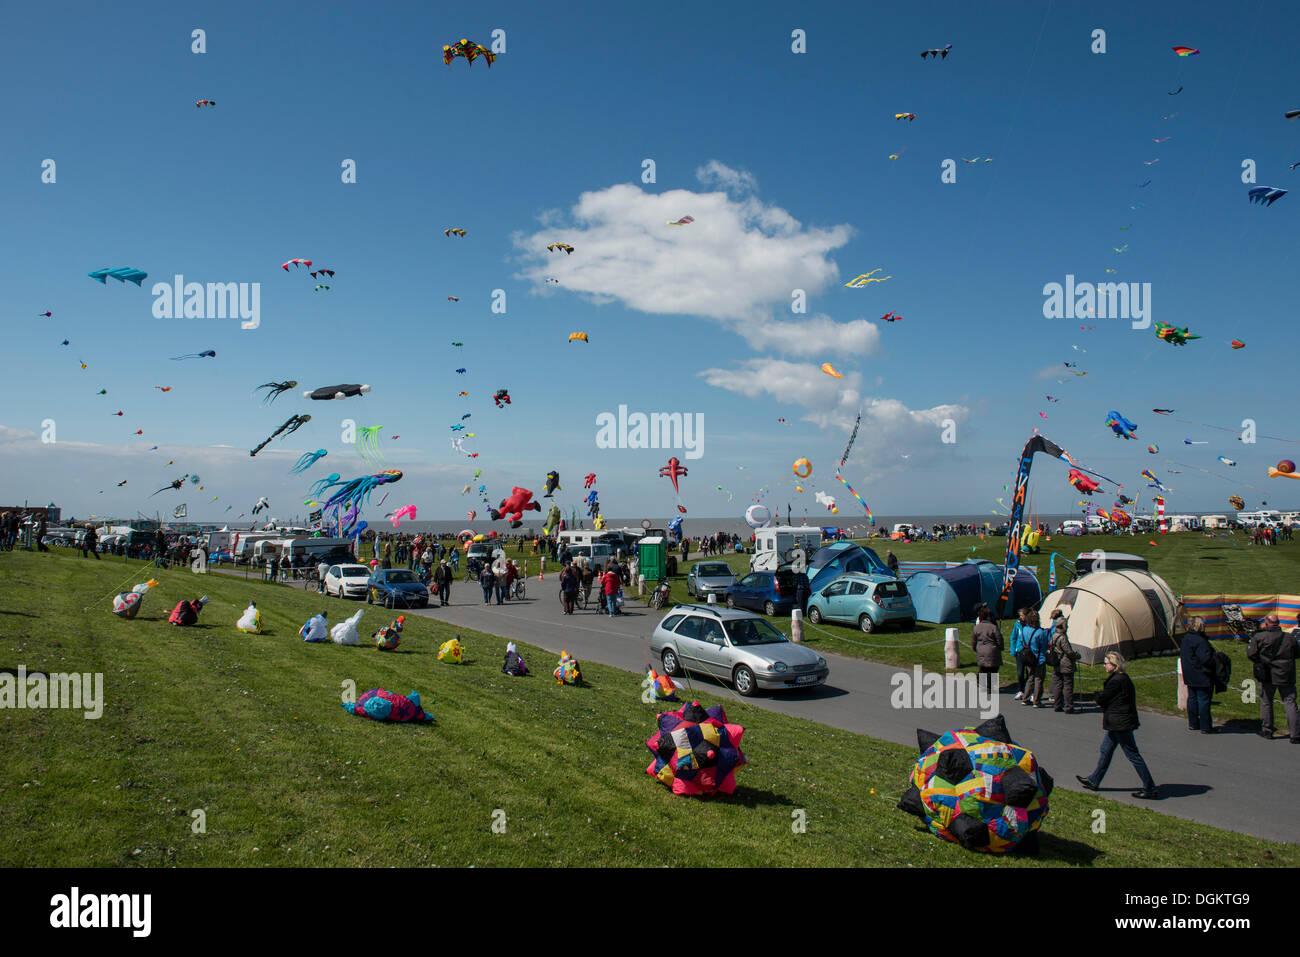 International Drachenfest kite festival, Norddeich, Frisia orientale, Bassa Sassonia Immagini Stock